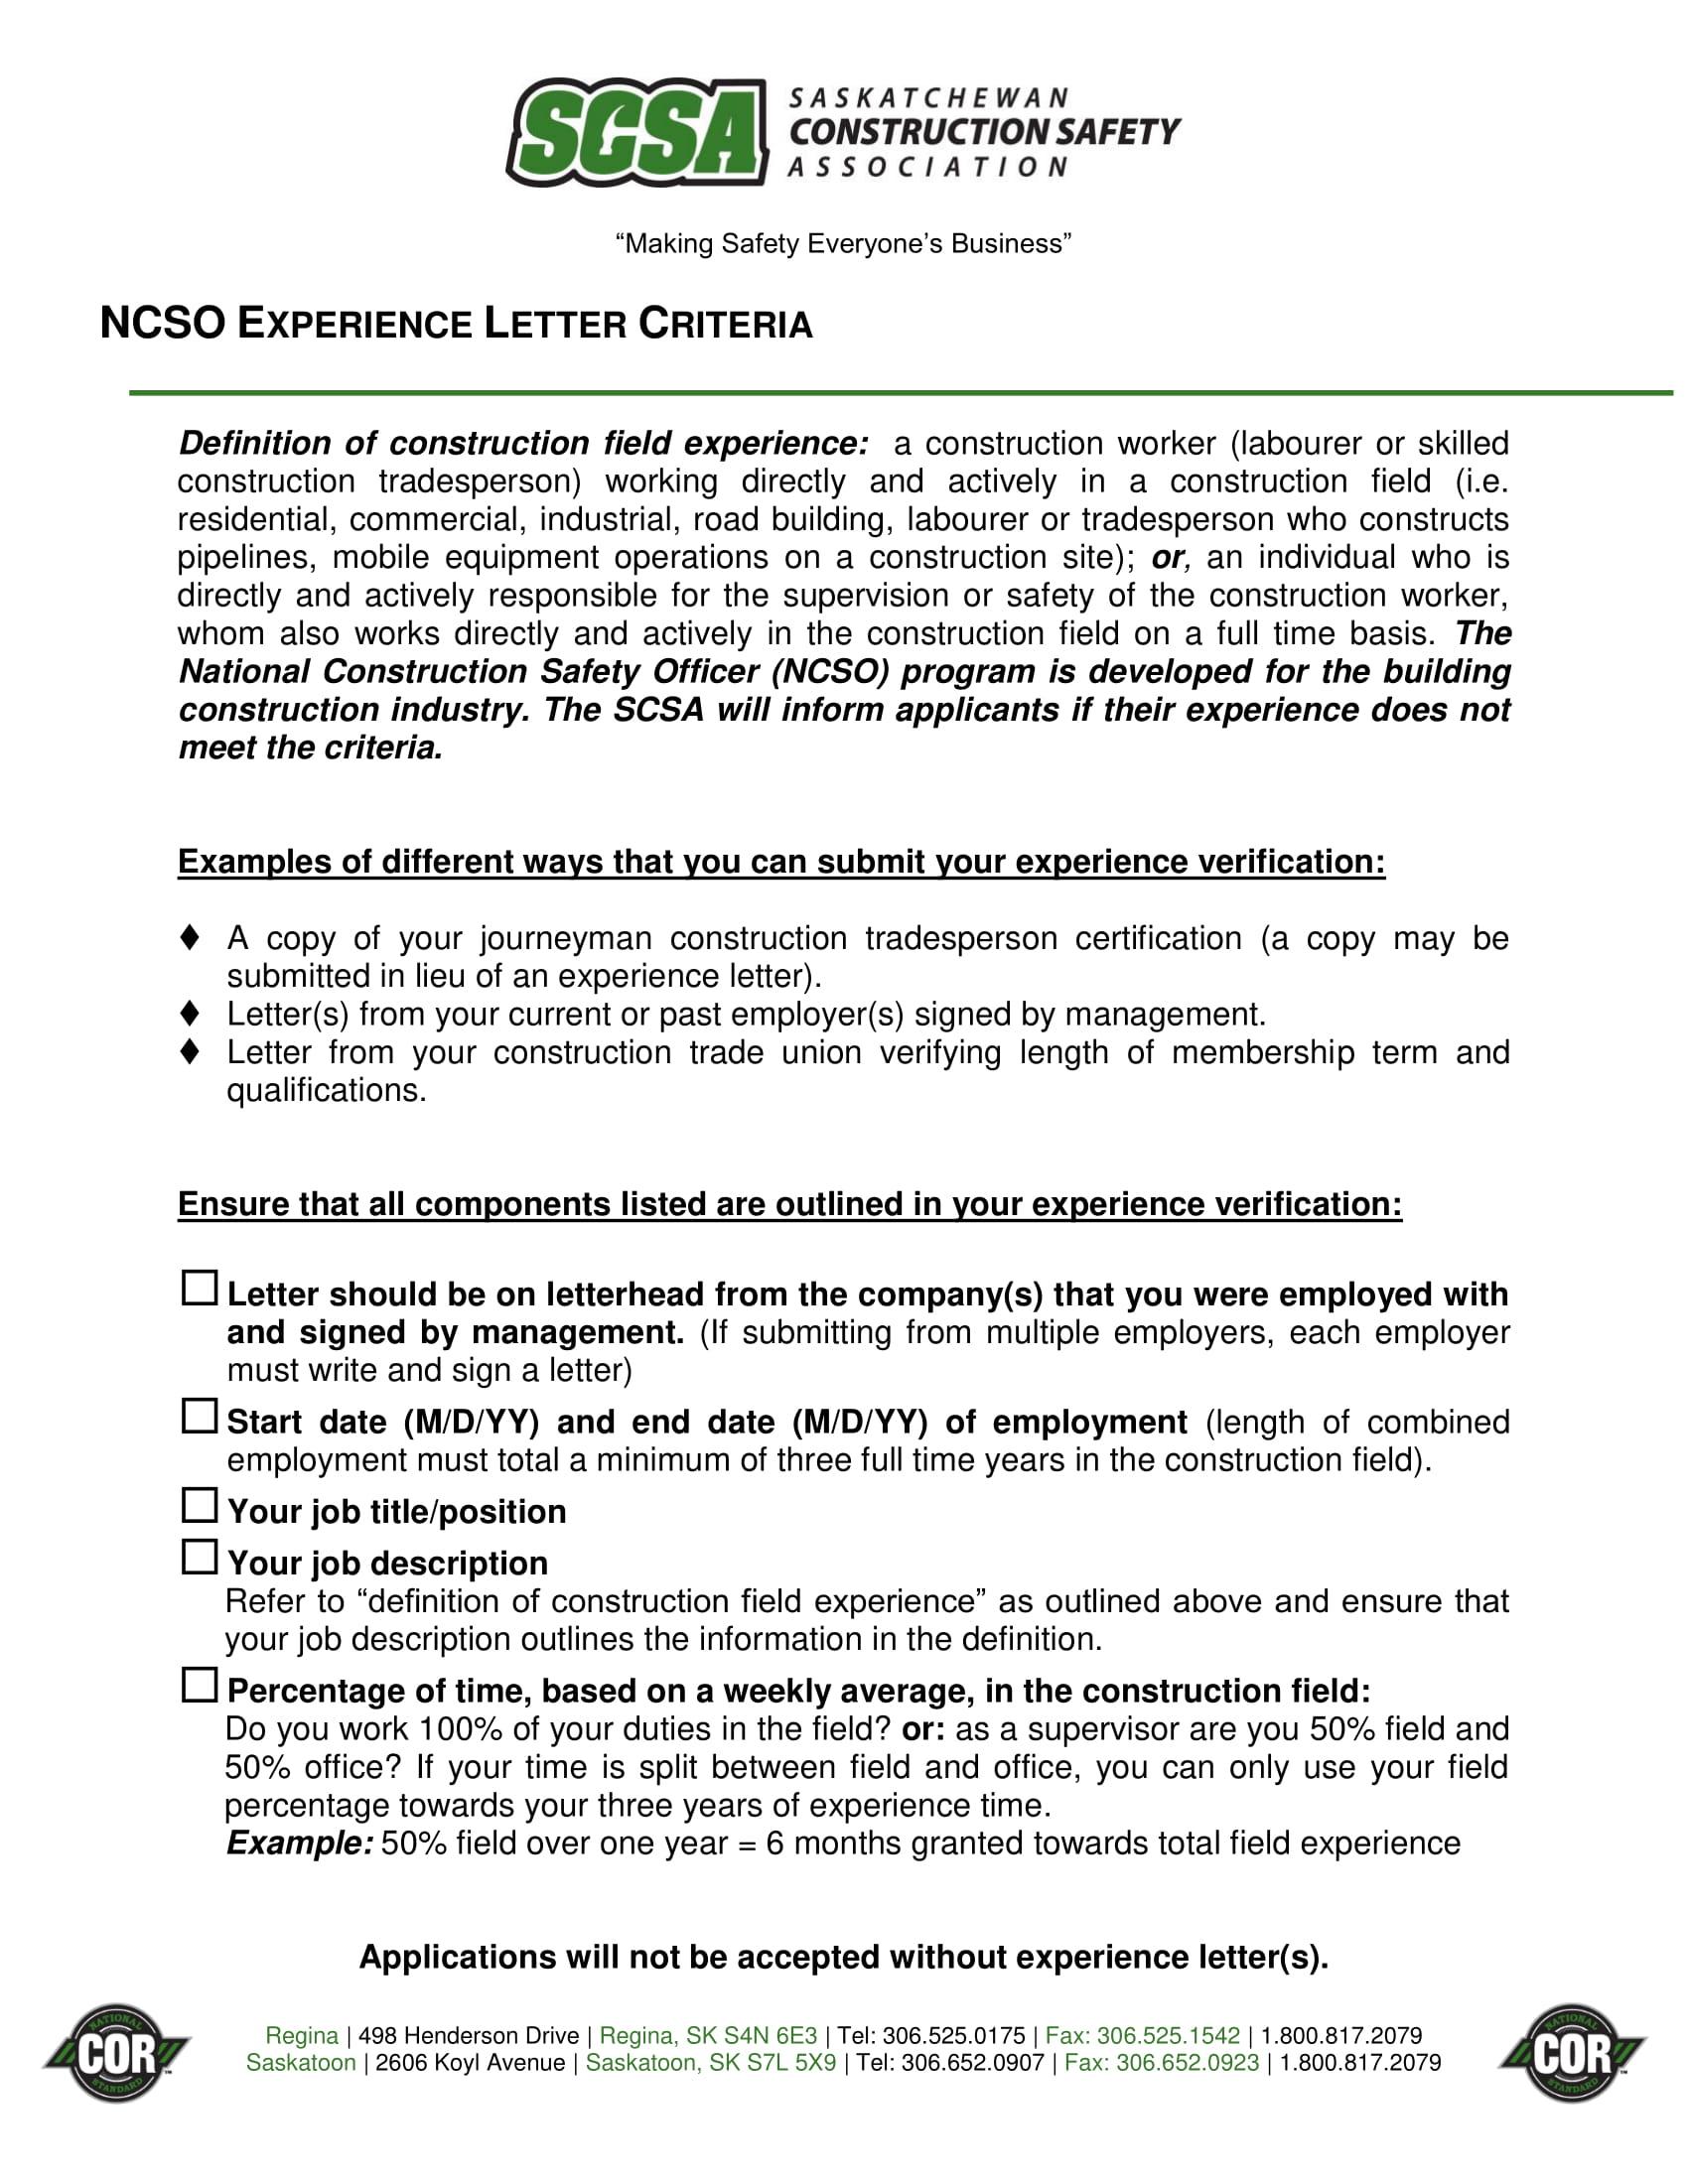 experience letter criteria 1